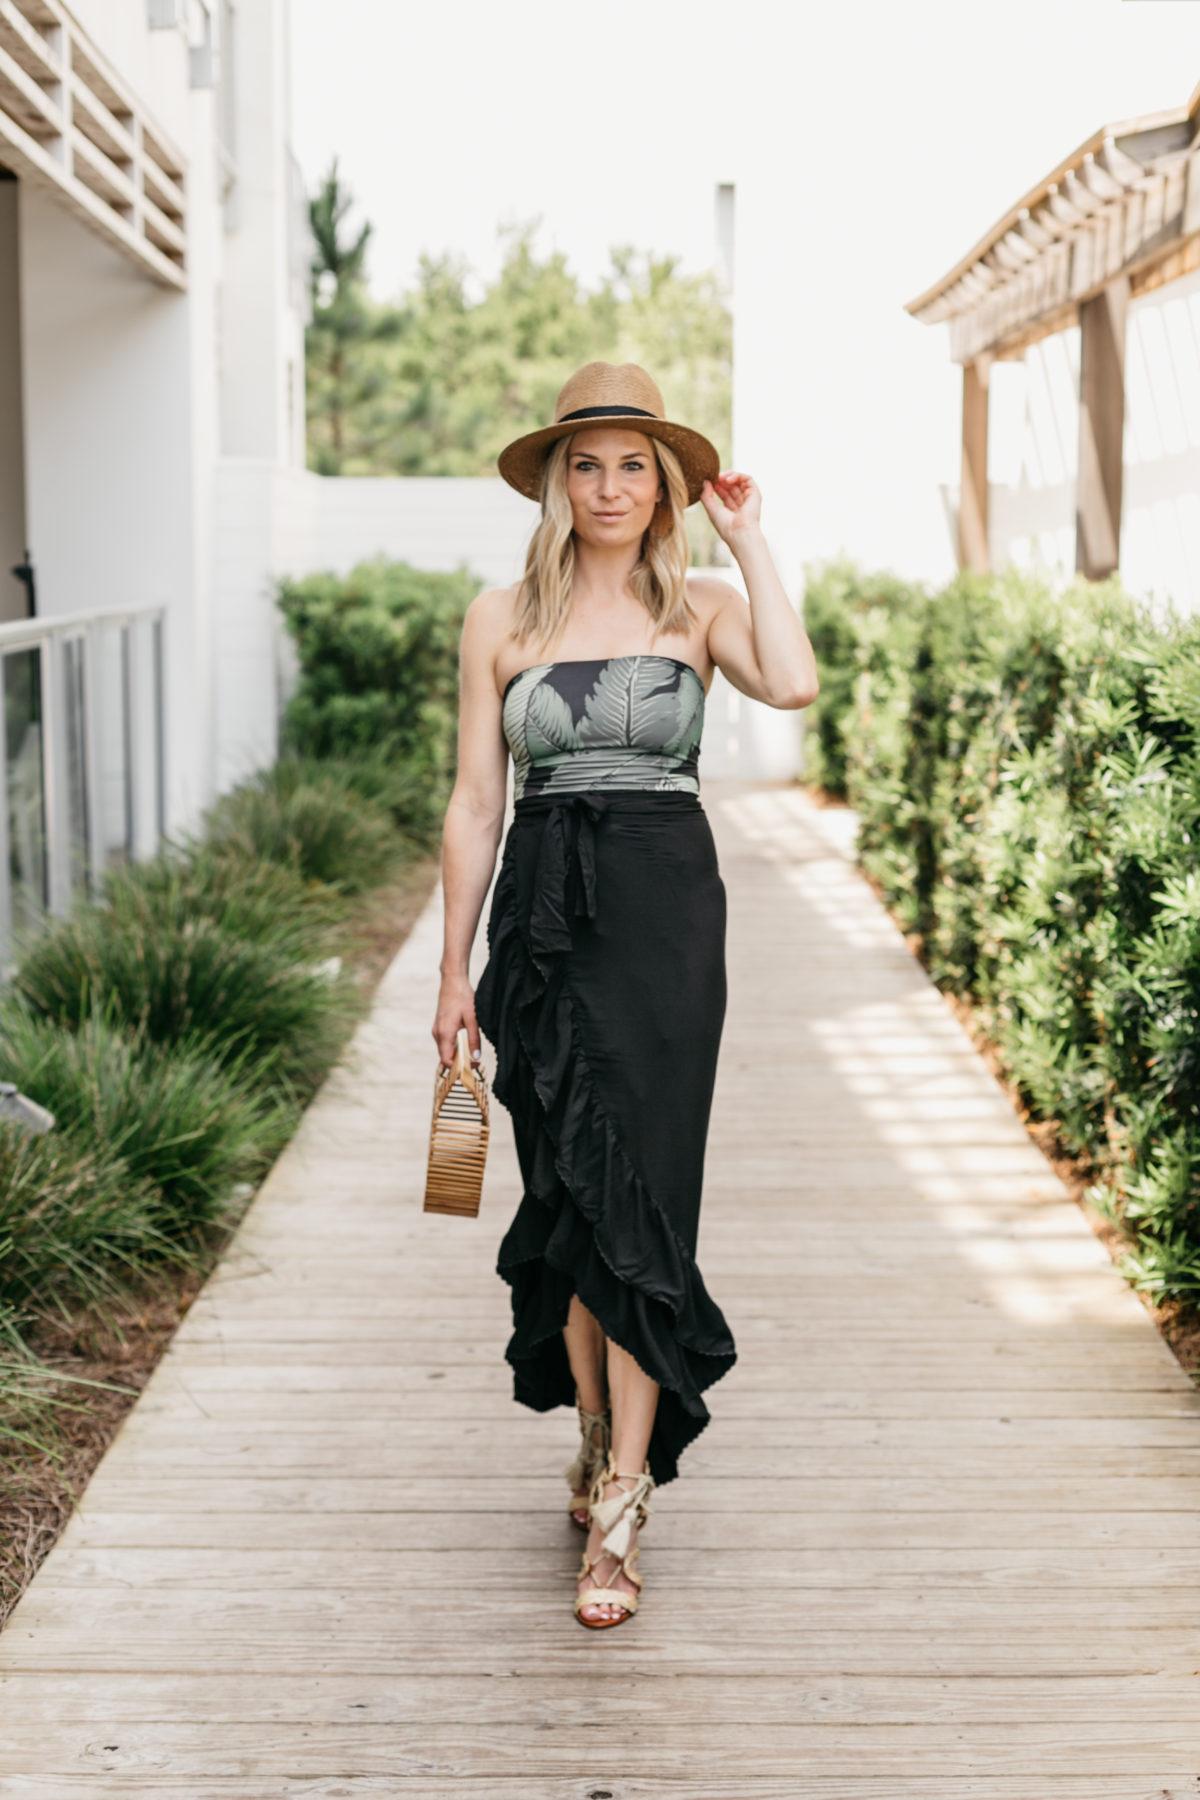 Broke Outfit Details: Palm Print Bodysuit/Swimsuit // Black Ruffle Midi Skirt // Strappy Heel // Straw Hat // Wooden Bag